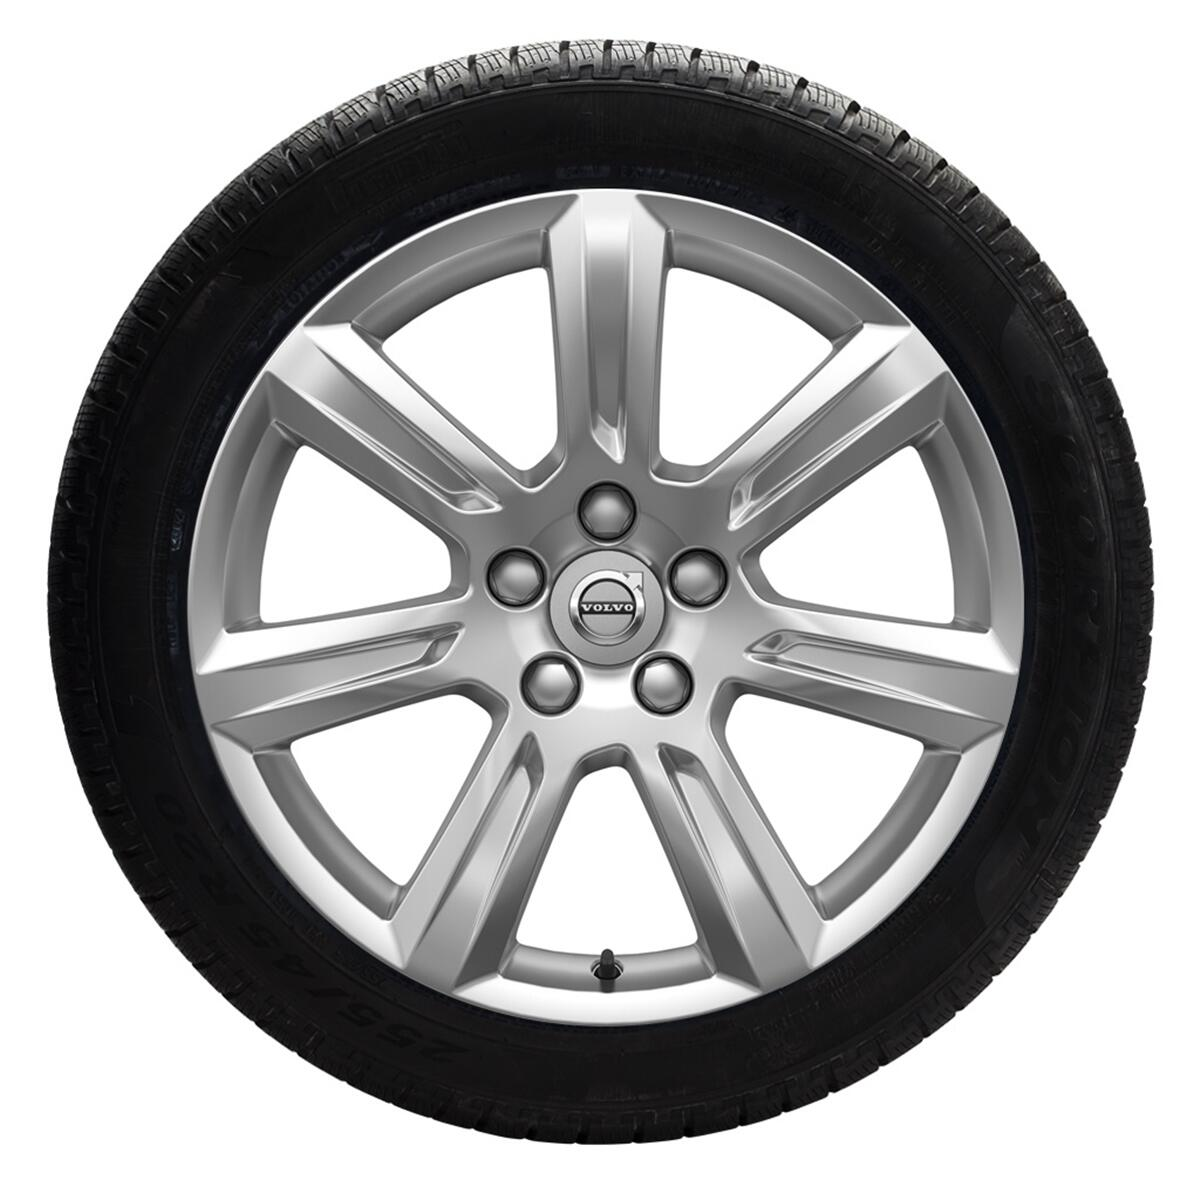 "Komplet zimskih koles: 43,18 cm (17""), pnevmatike Michelin"